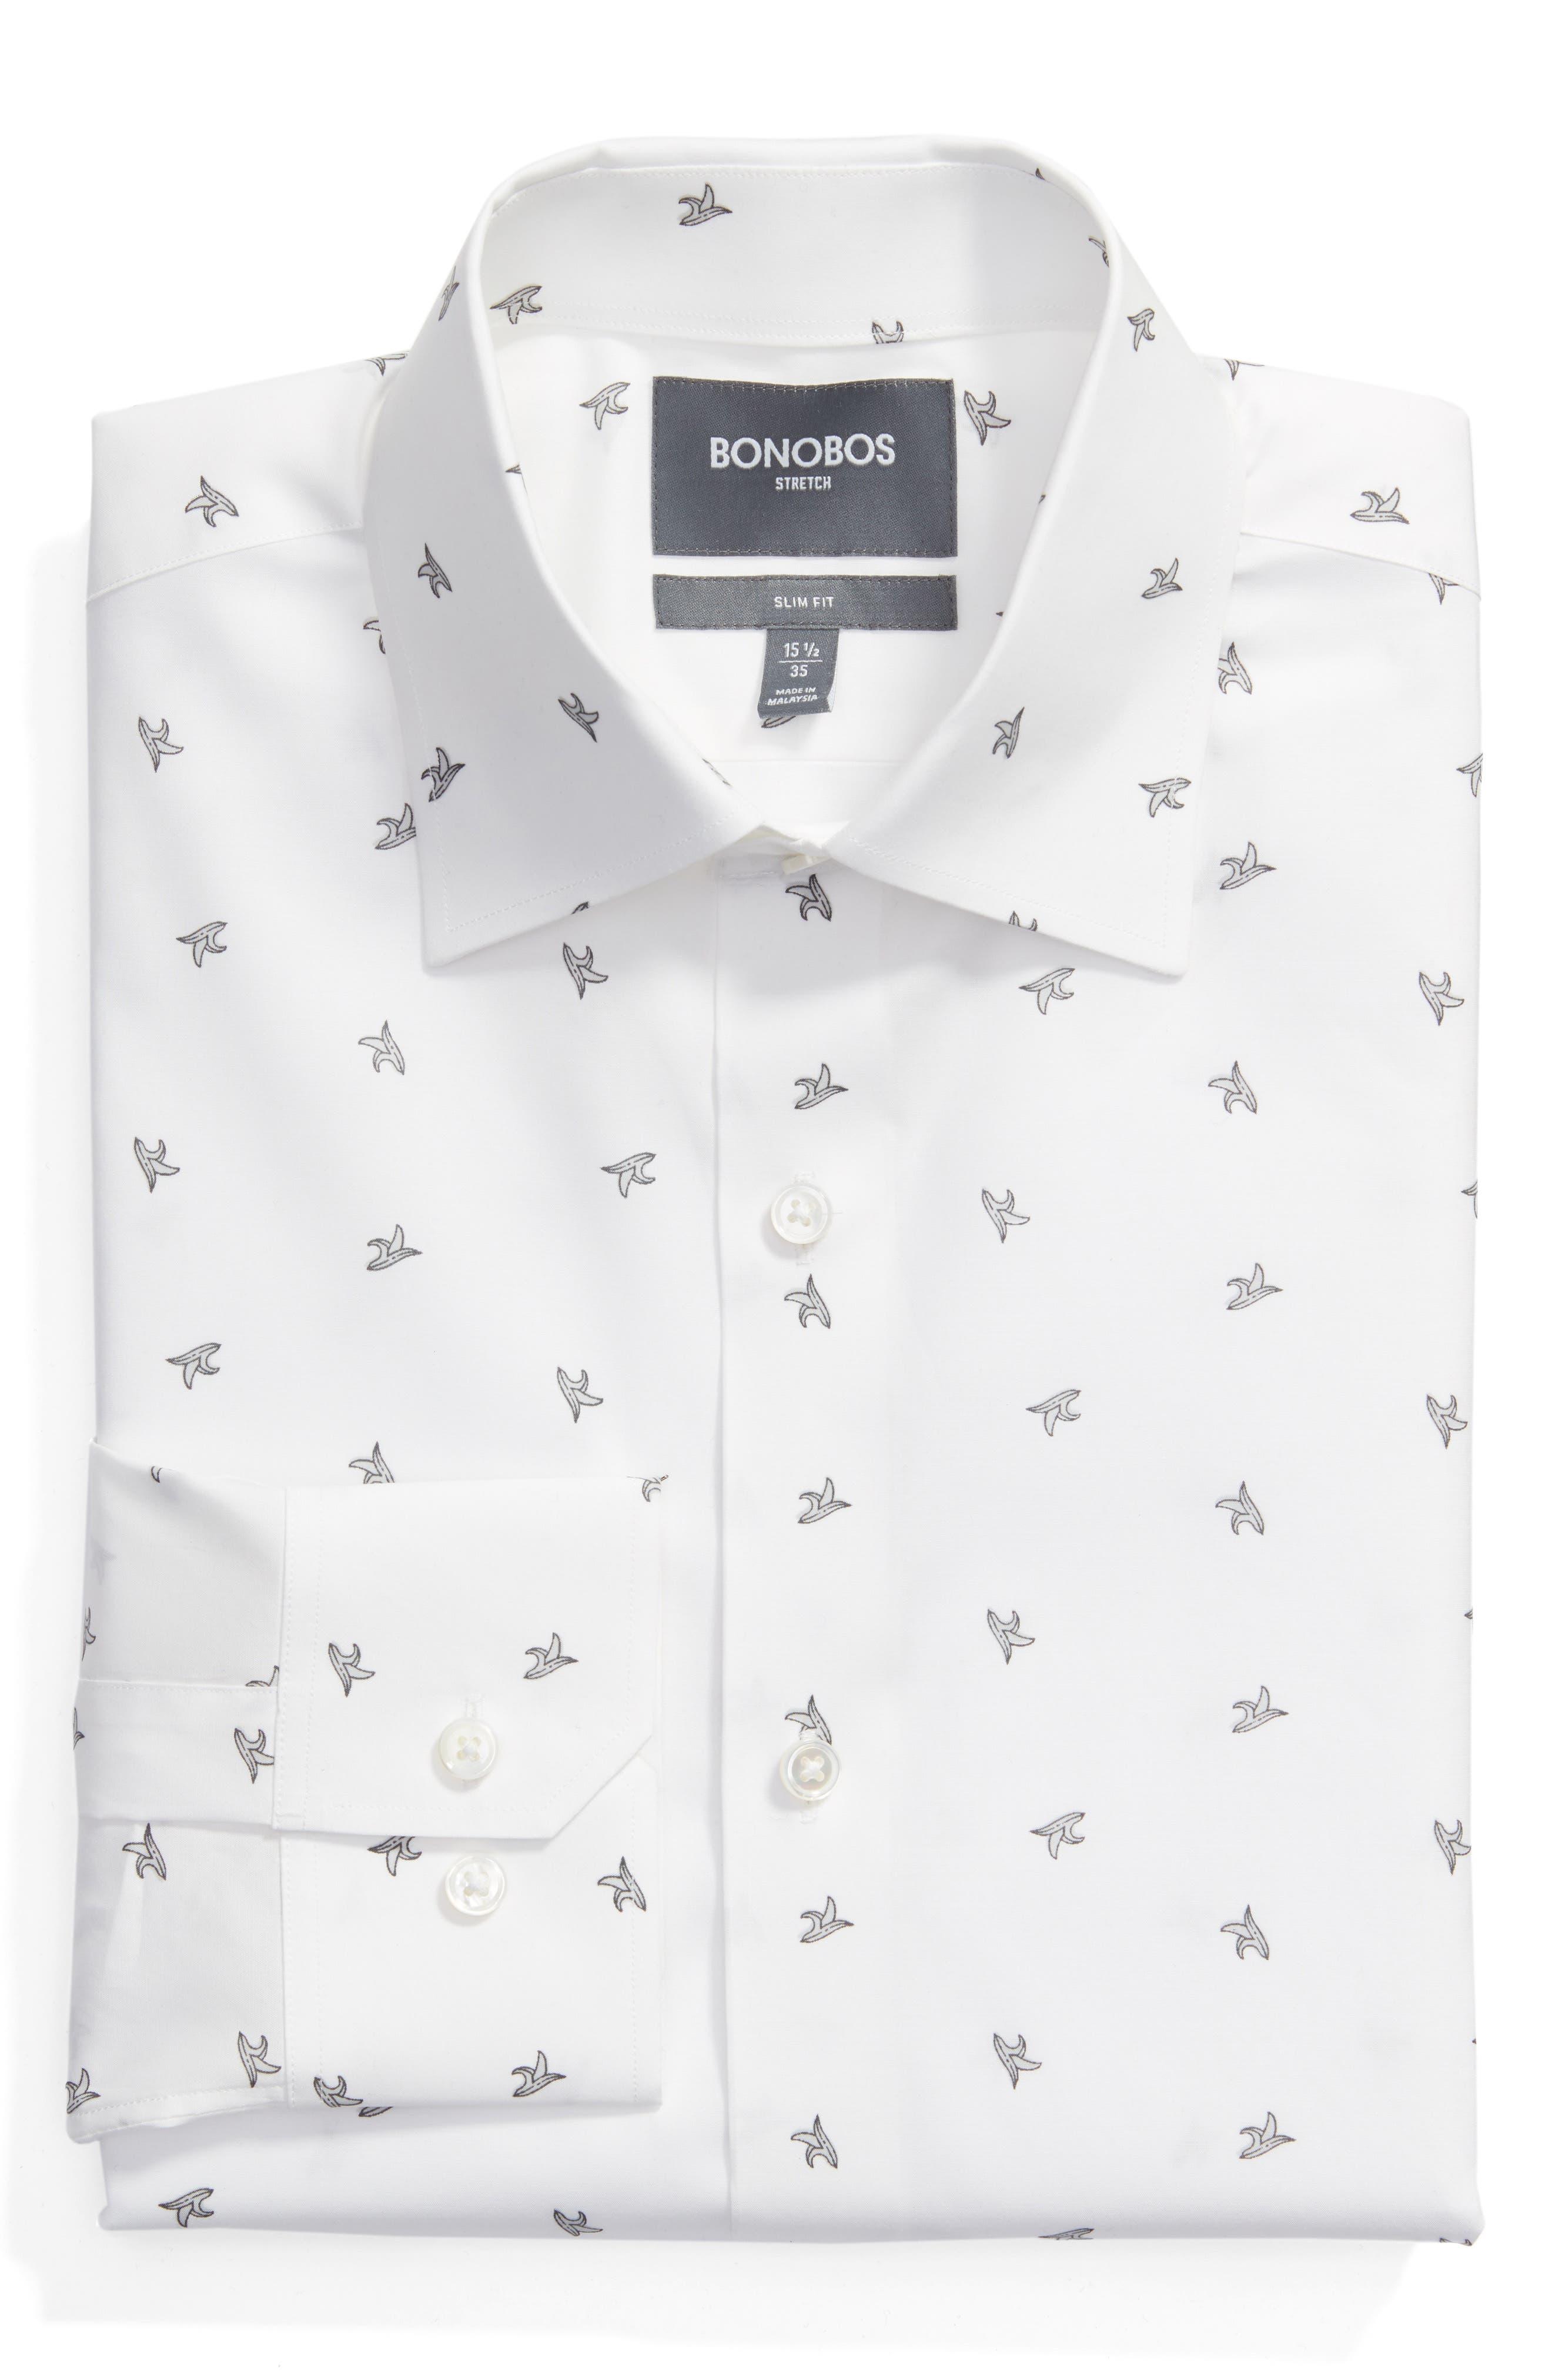 Bonobos Slim Fit Banana Print Dress Shirt